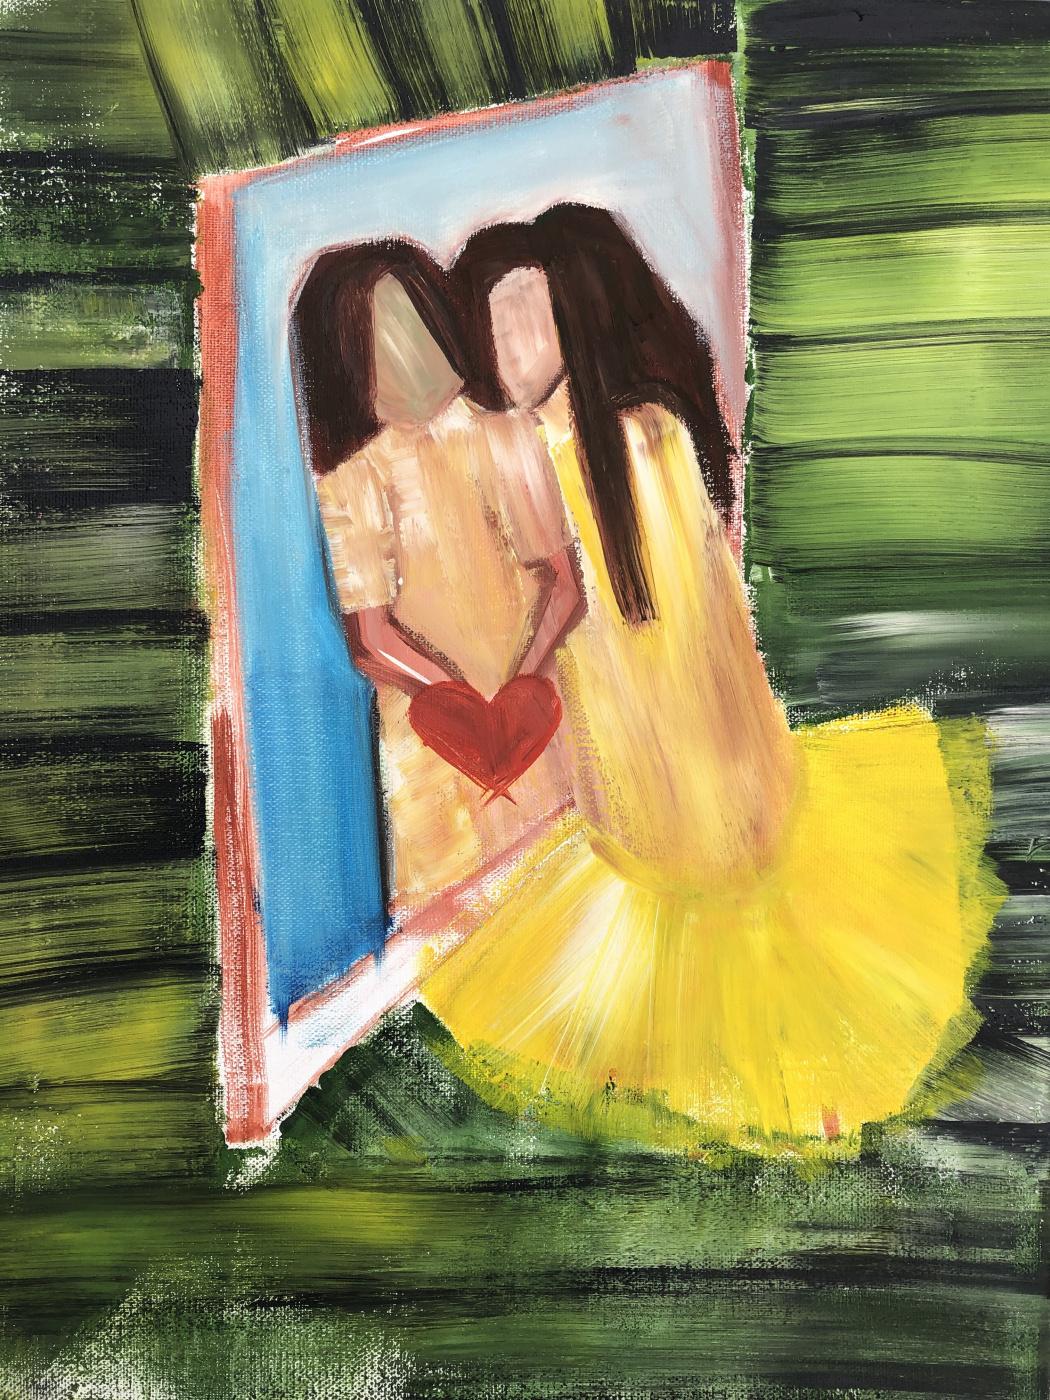 Anastasia Merris. Touching the looking glass